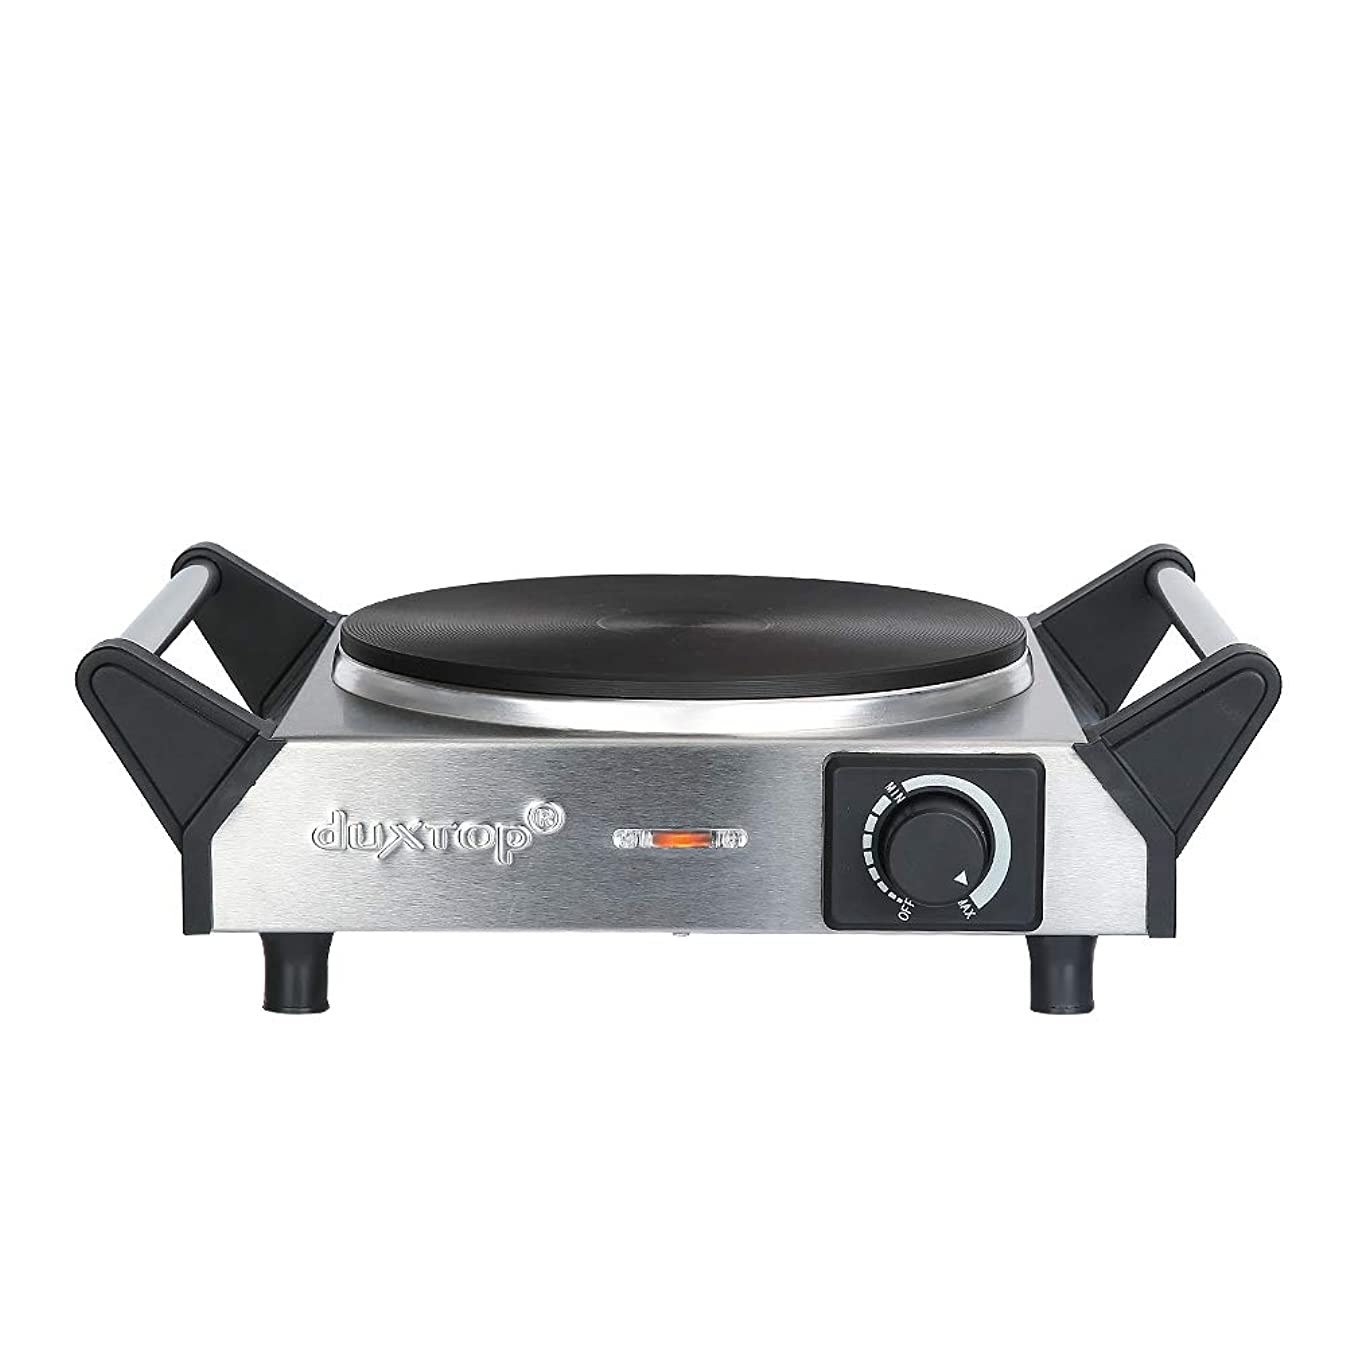 Duxtop ES-3102 1500W Portable Electric Cast Iron Cooktop Countertop Burner (Single), 7.5 inch, Silver